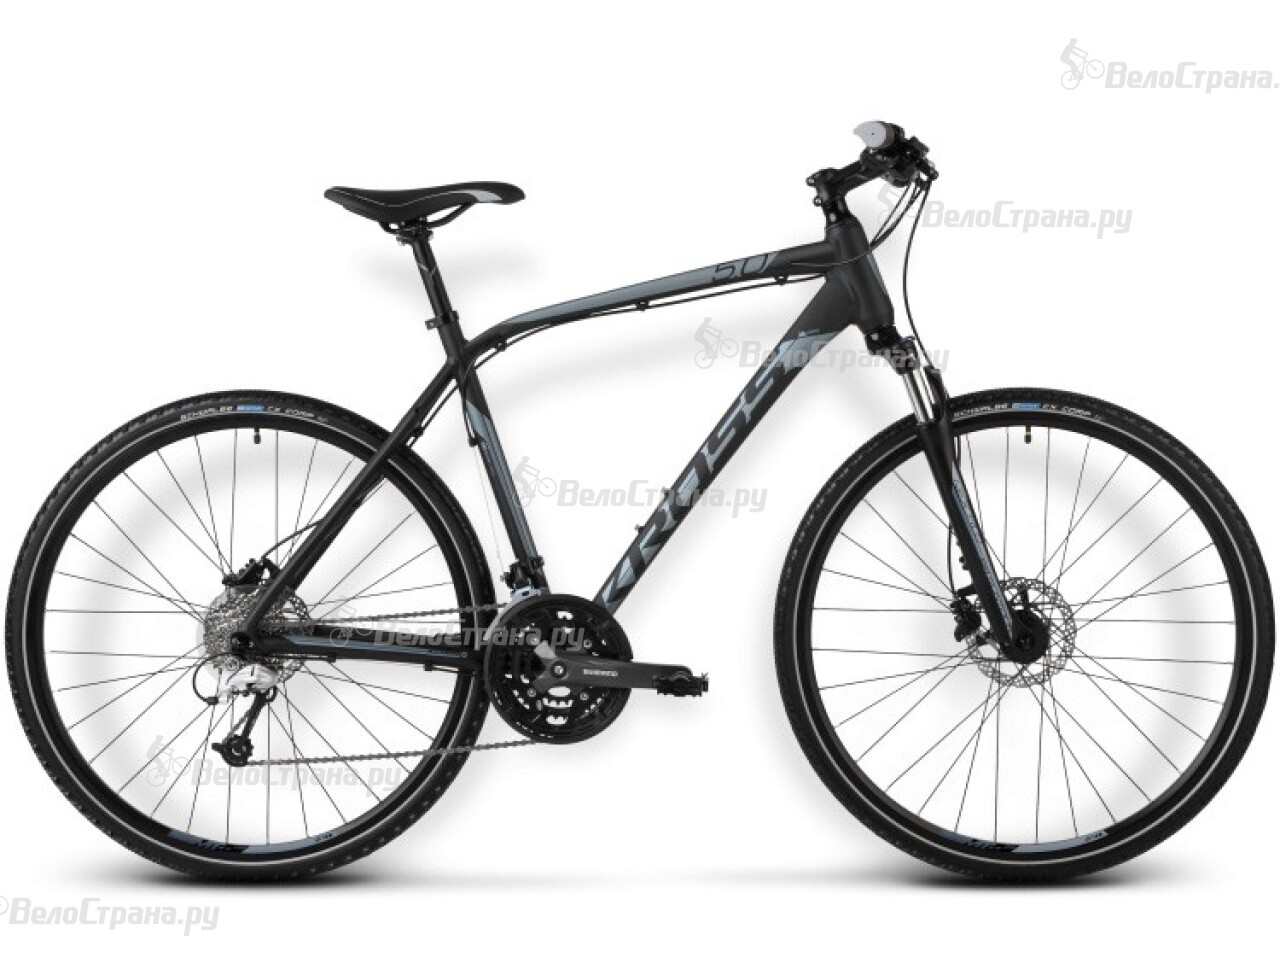 Велосипед Kross EVADO 5.0 (2016) велосипед kross evado 1 0 lady 2017